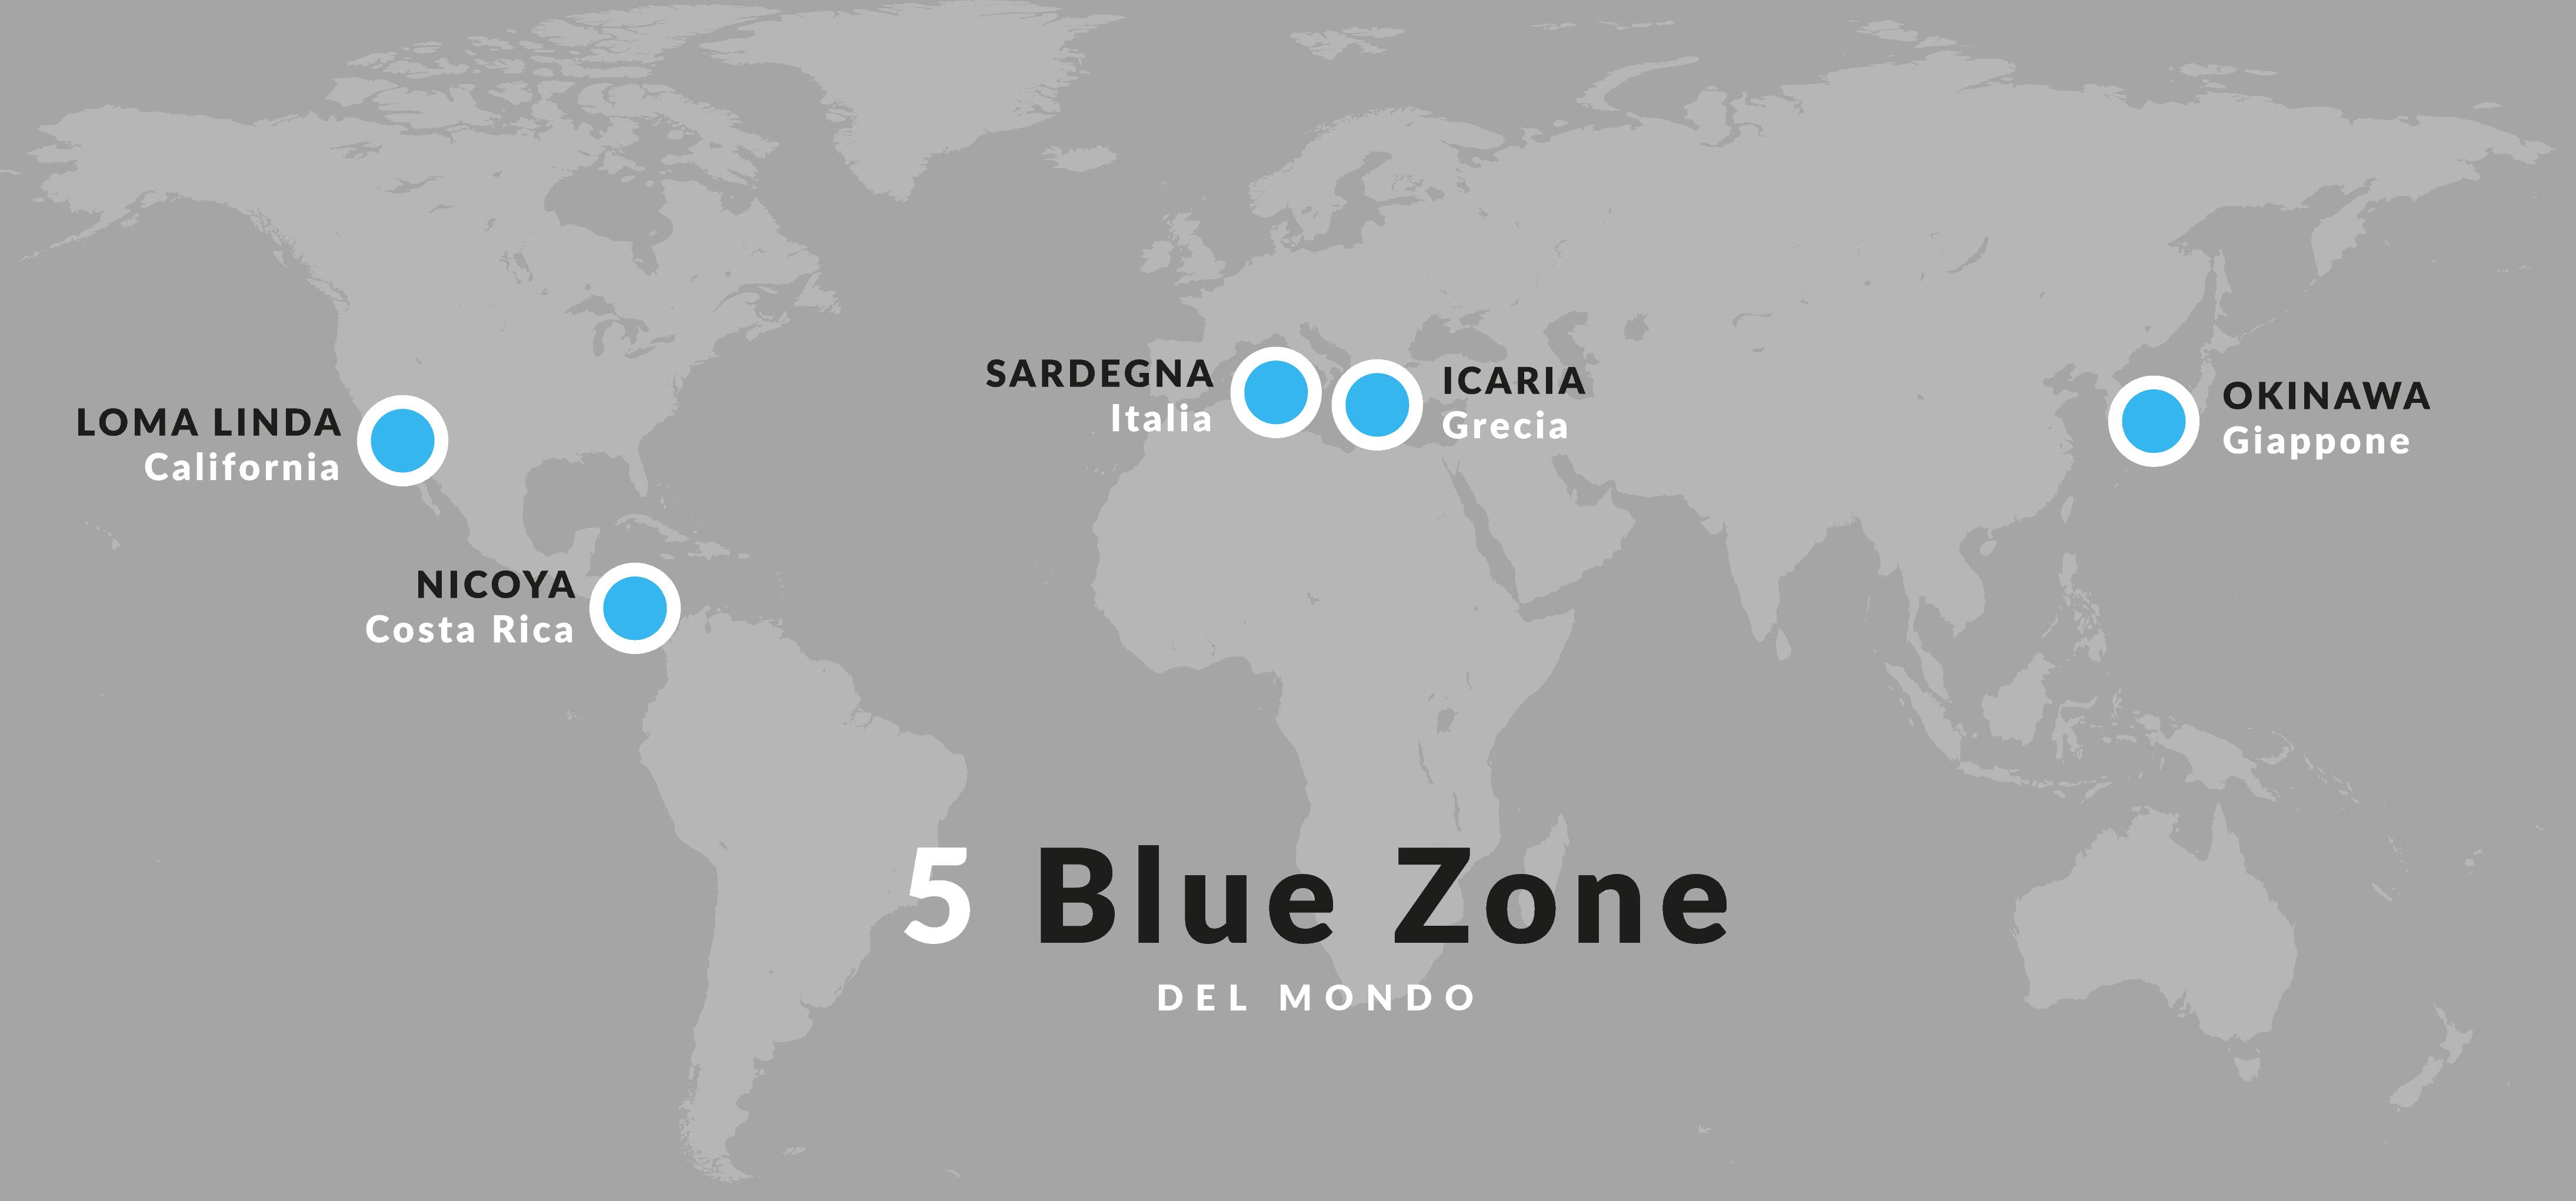 Sardegna Blue Zone